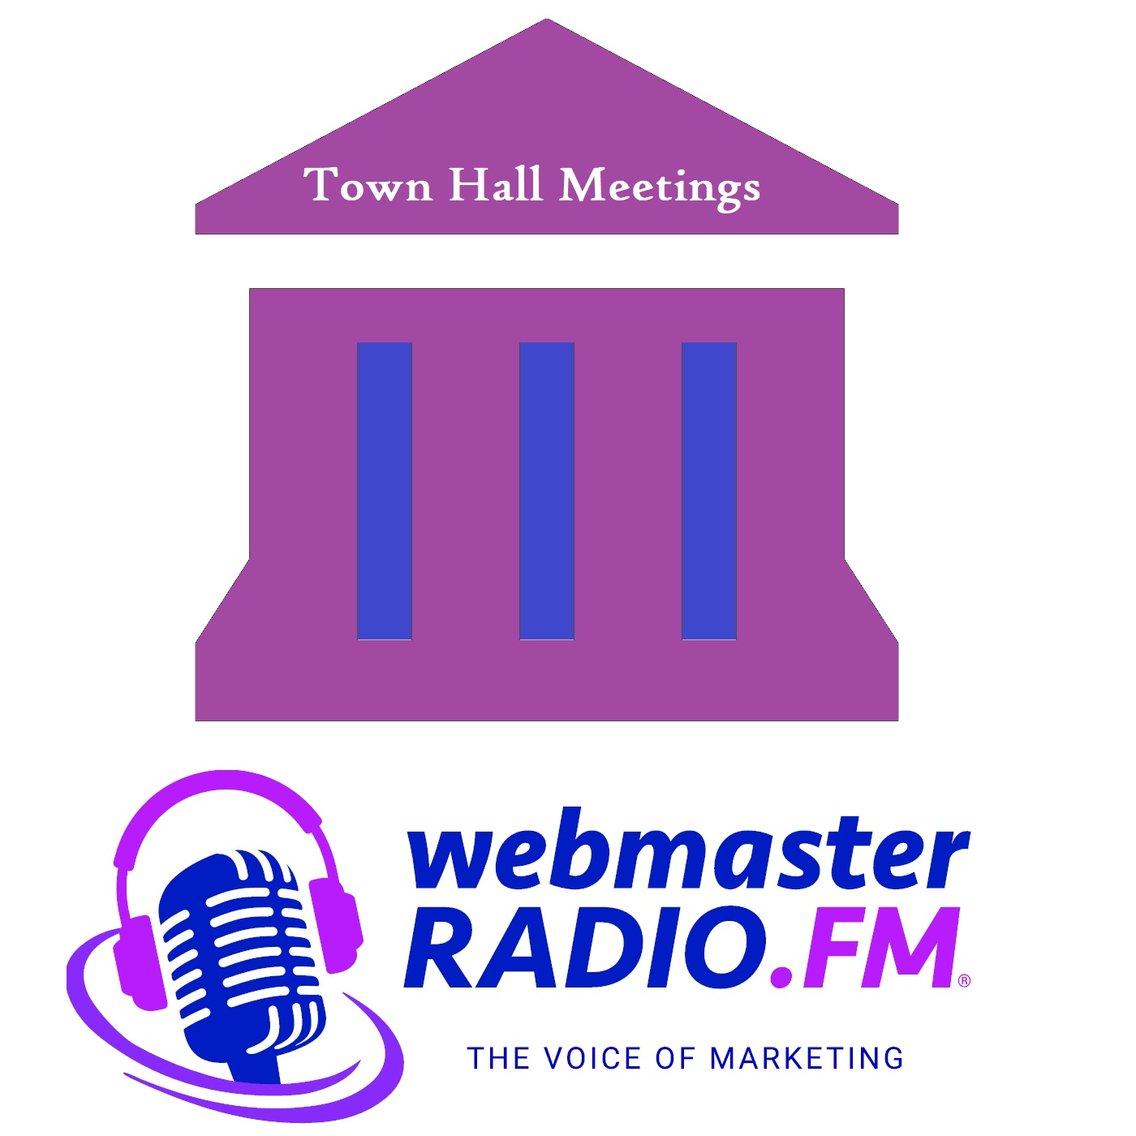 WebmasterRadio.FM Town Hall Meetings - imagen de portada